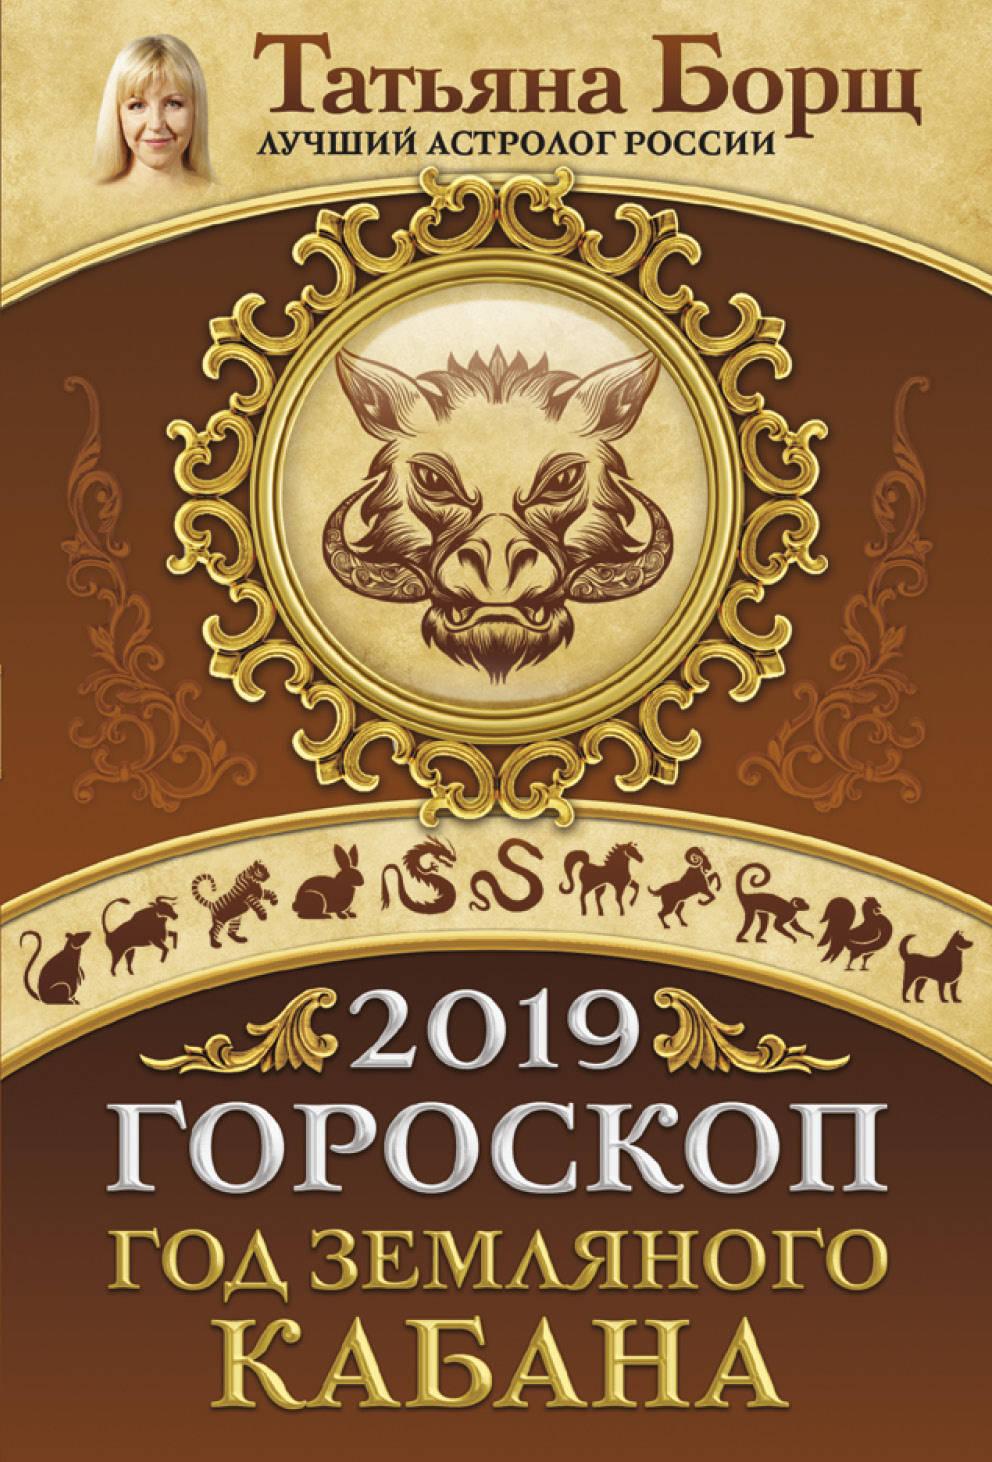 izmeritelplus.ru Гороскоп на 2019: год Земляного Кабана. Борщ Татьяна